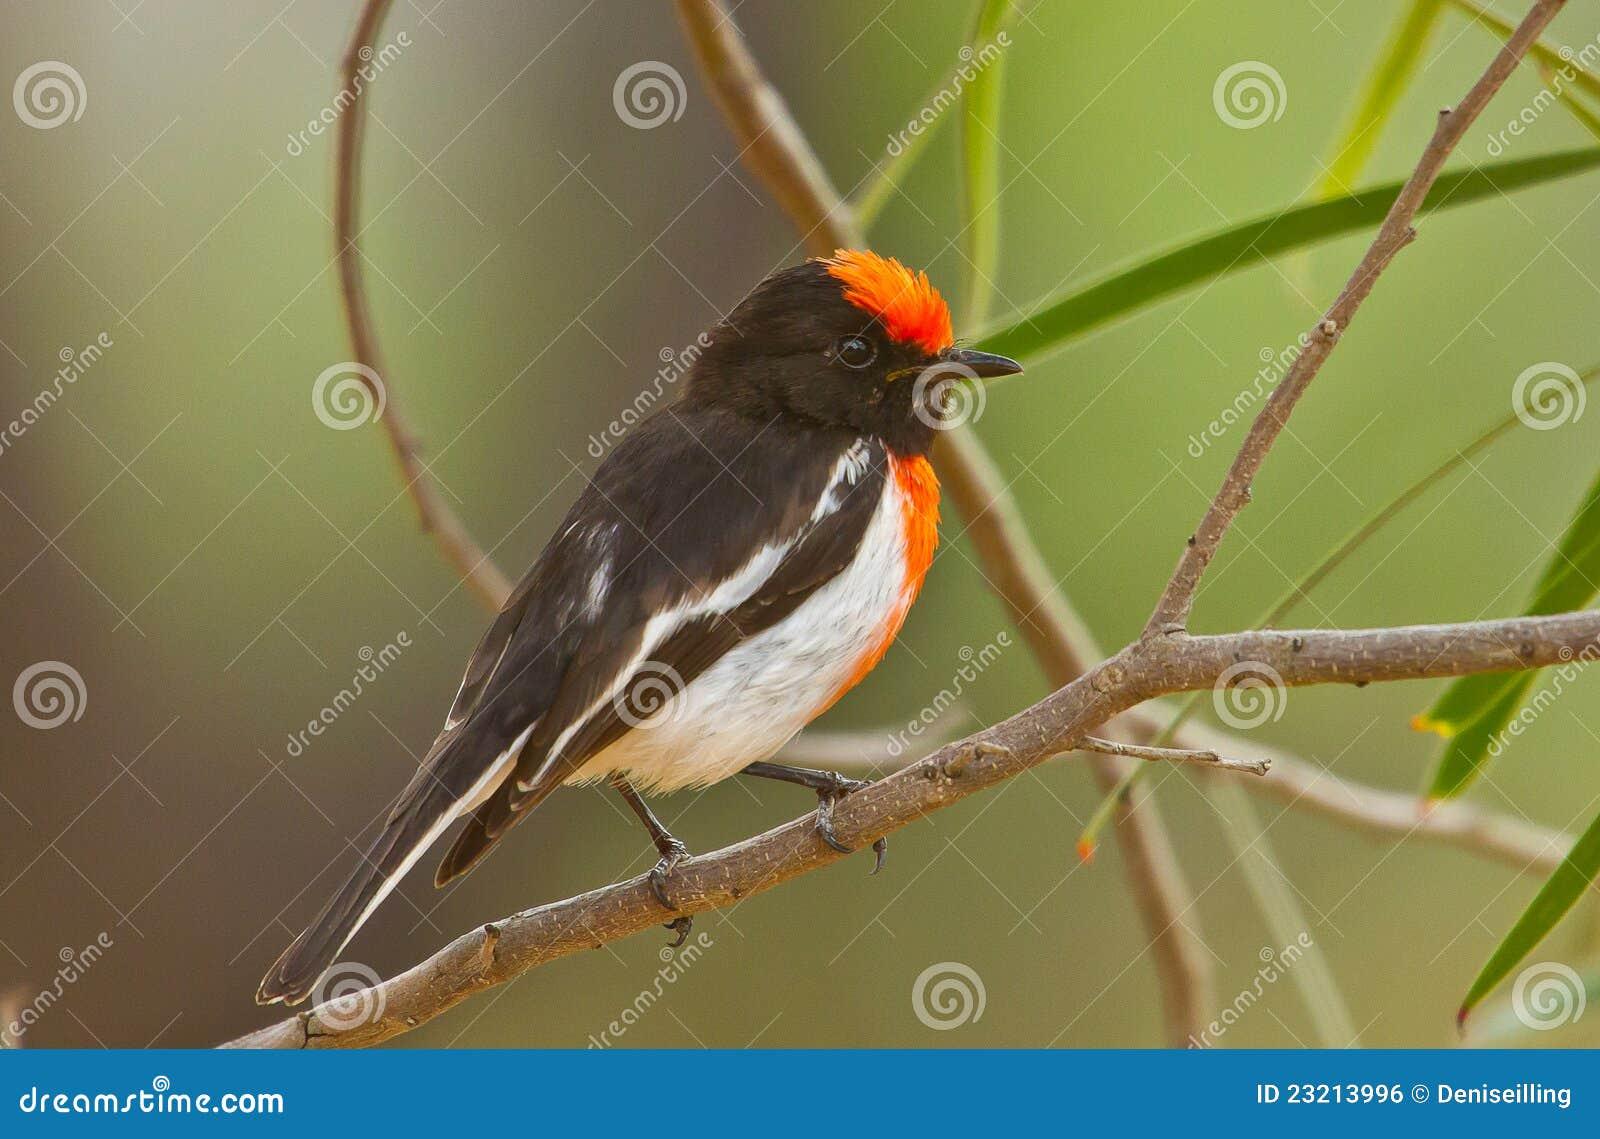 Capped male röd robin